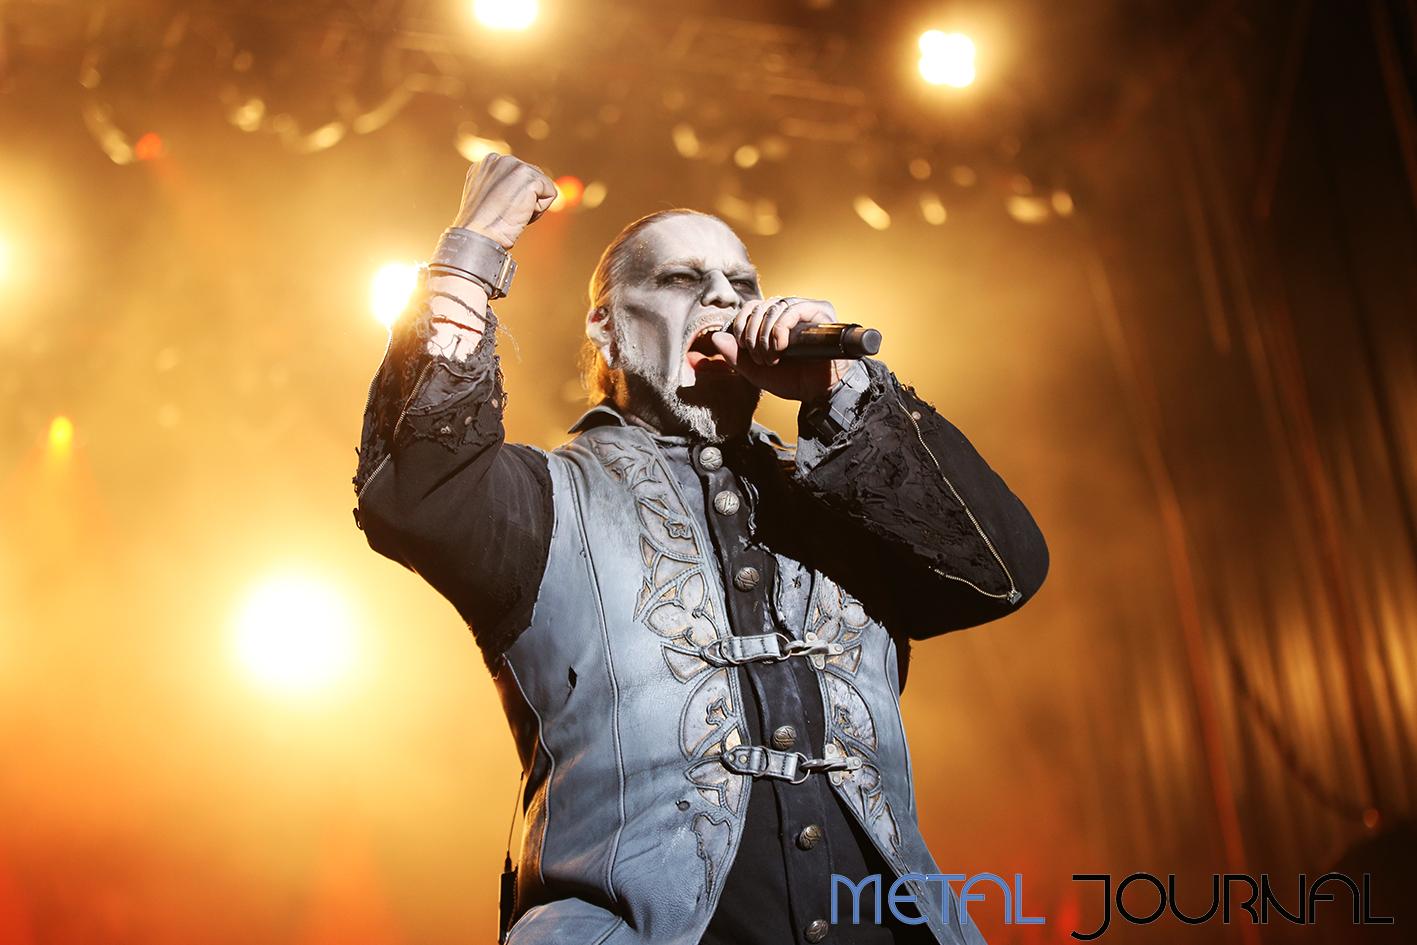 powerwolf - metal journal rock fest barcelona 2019 pic 1